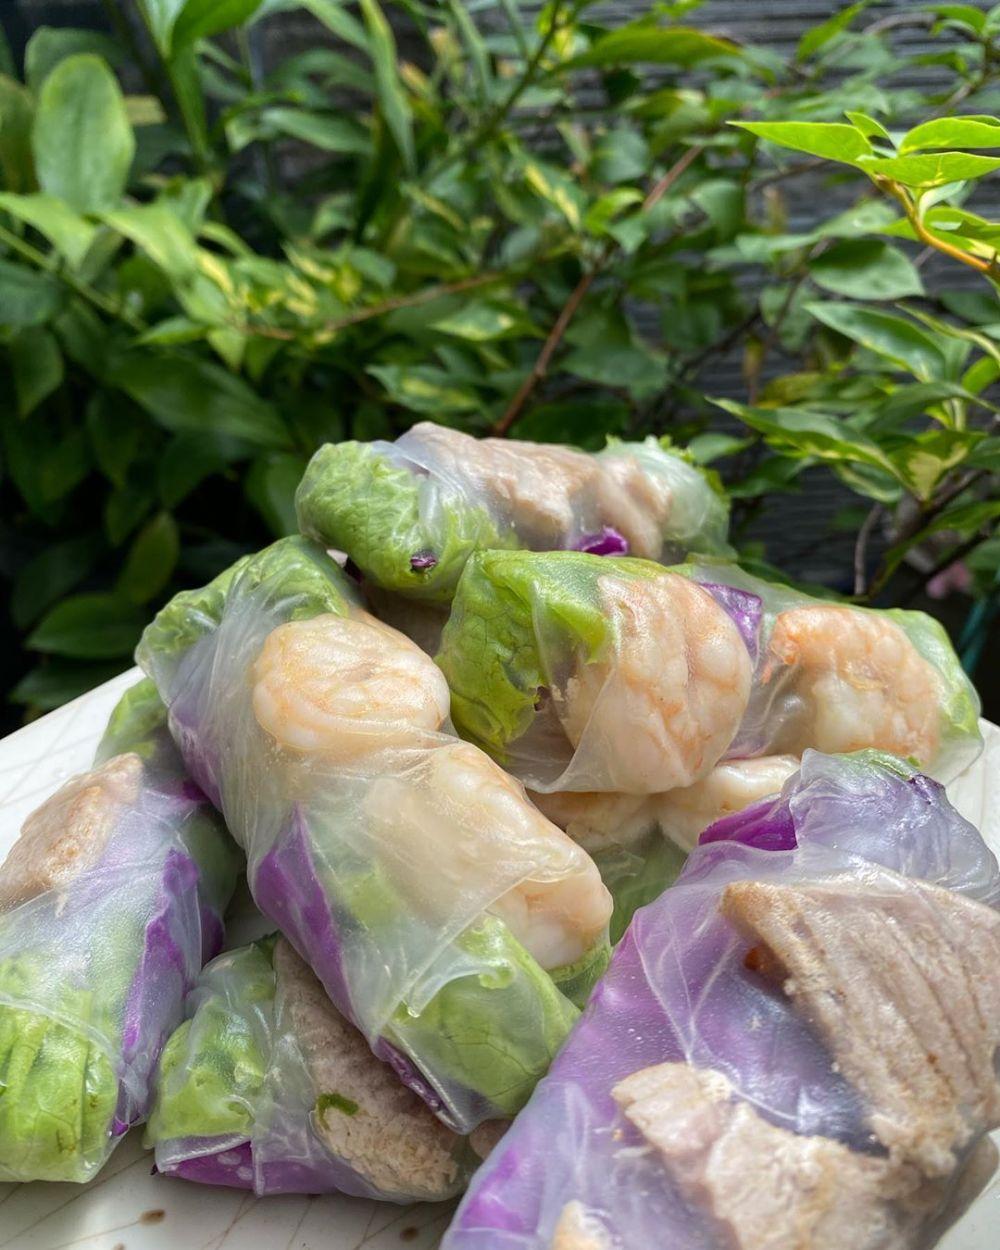 Resep membuat Vietnam Salad Spring Roll © 2020 brilio.net